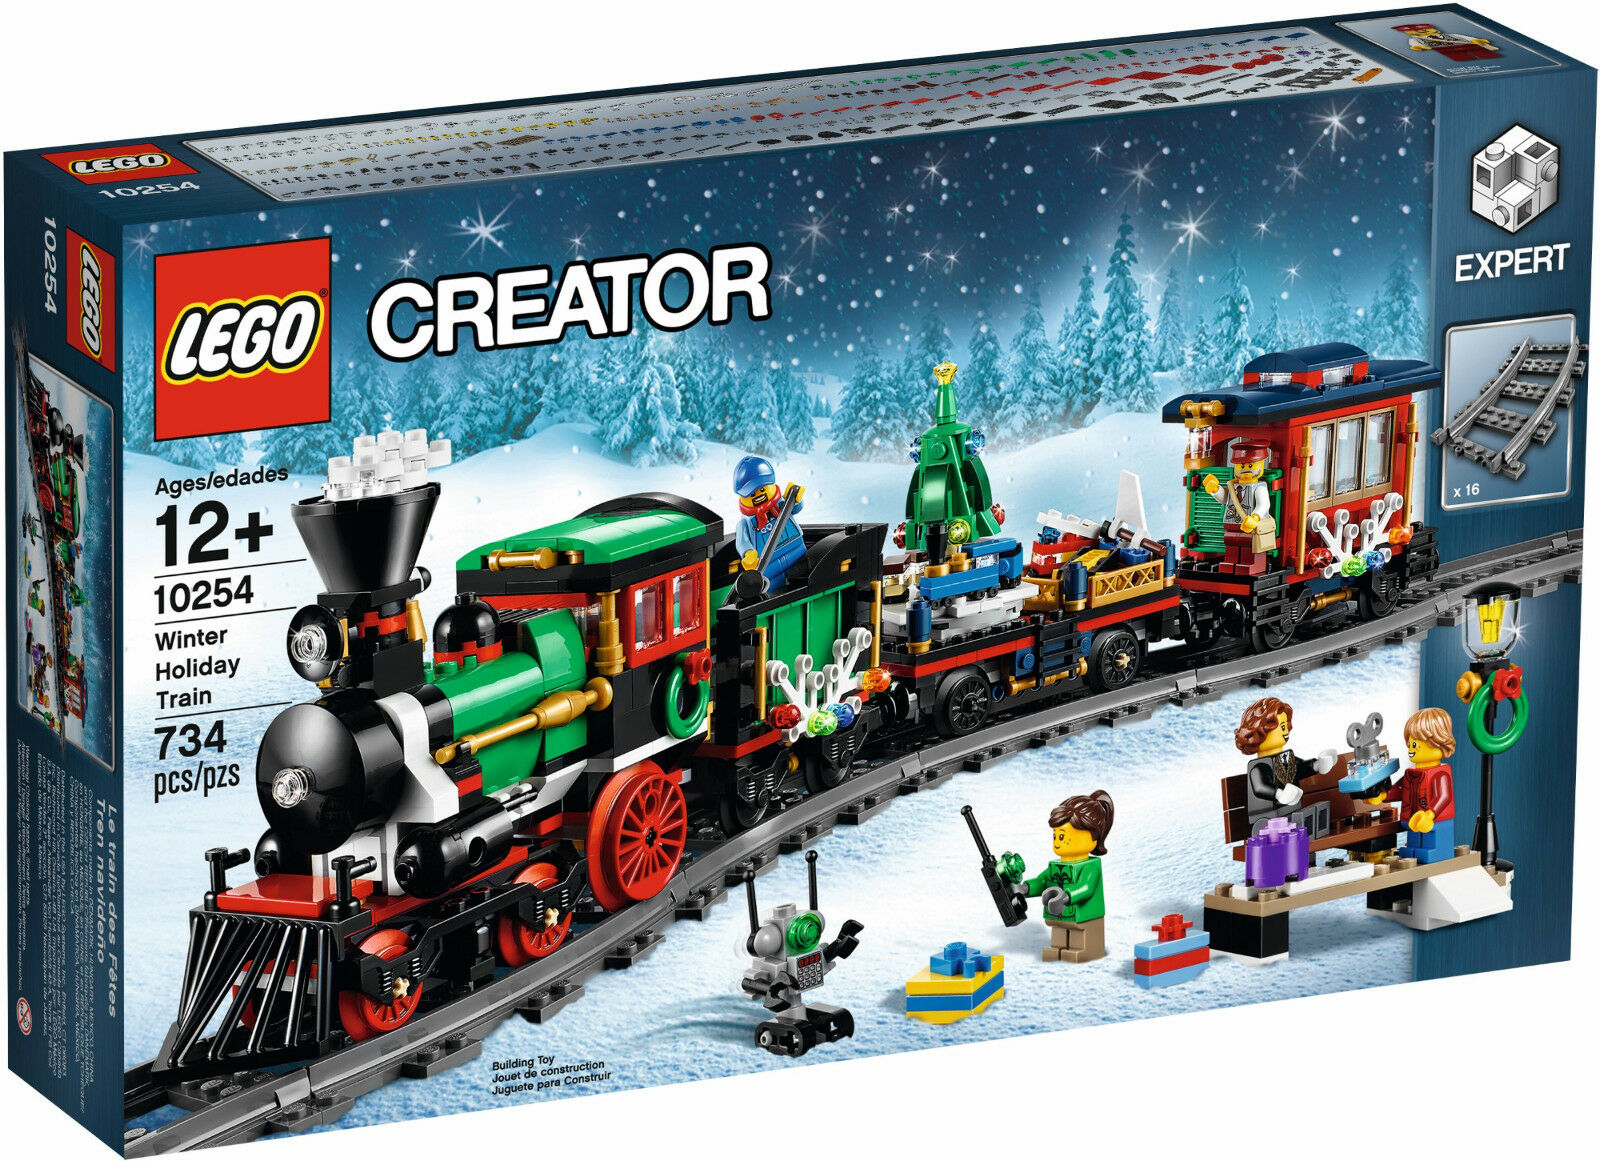 2016 LEGO EXPERT CREATOR CHRISTMAS WINTER HOLIDAY TRAIN 10254, NEW&SEALED